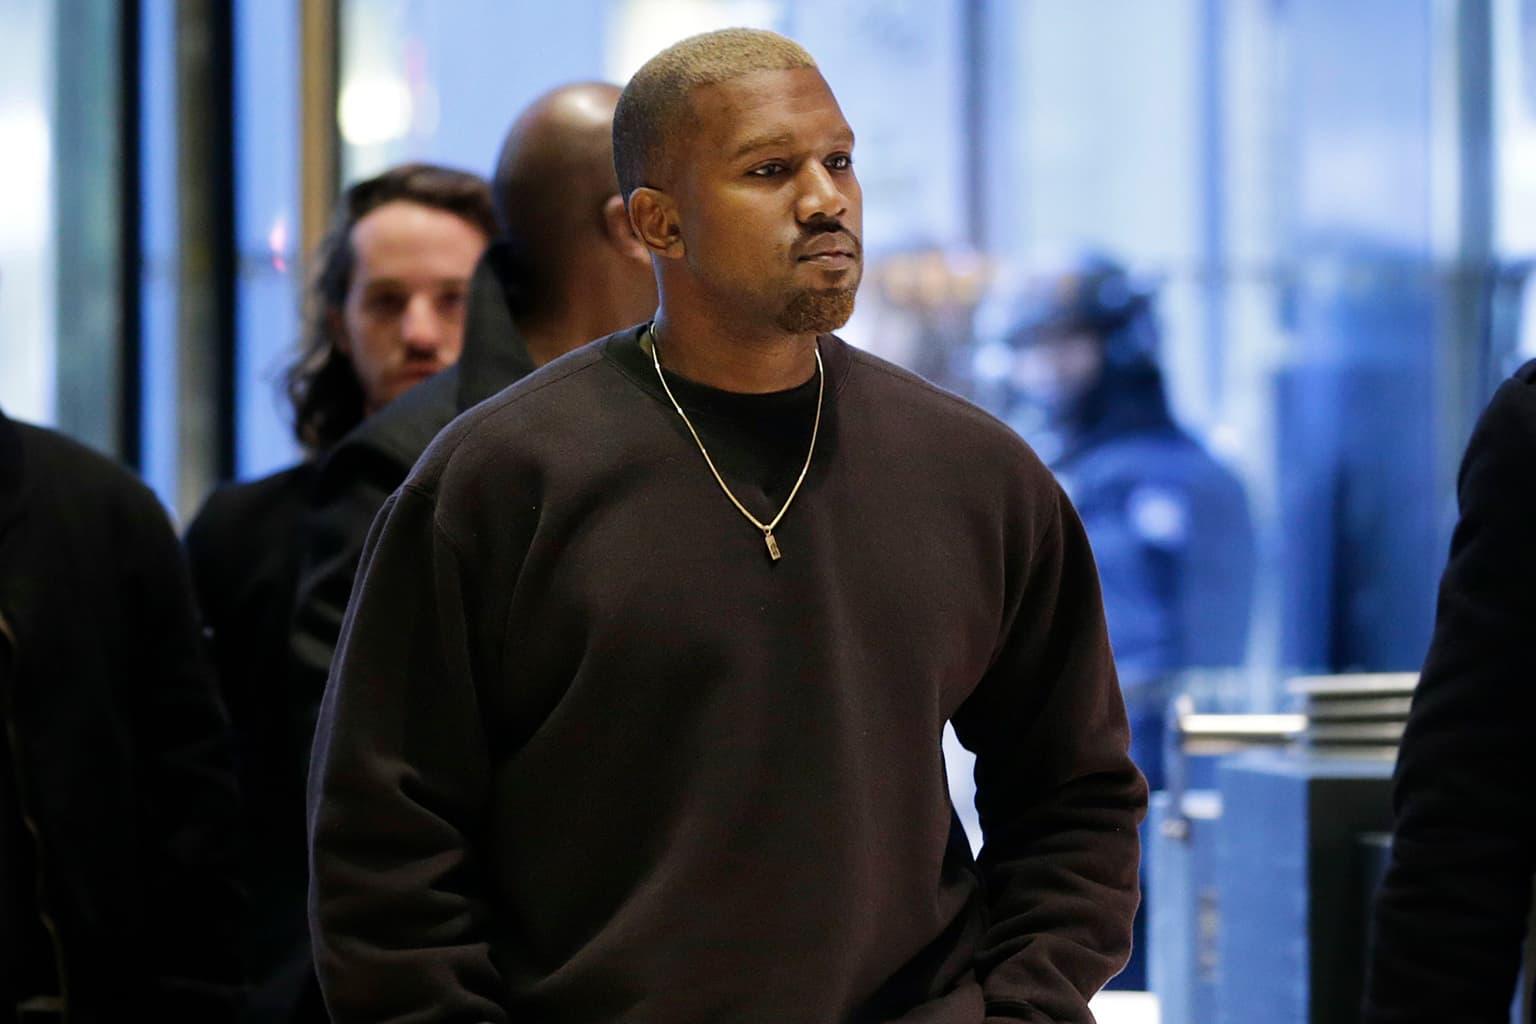 Two New Kanye West Tracks Emerge Online